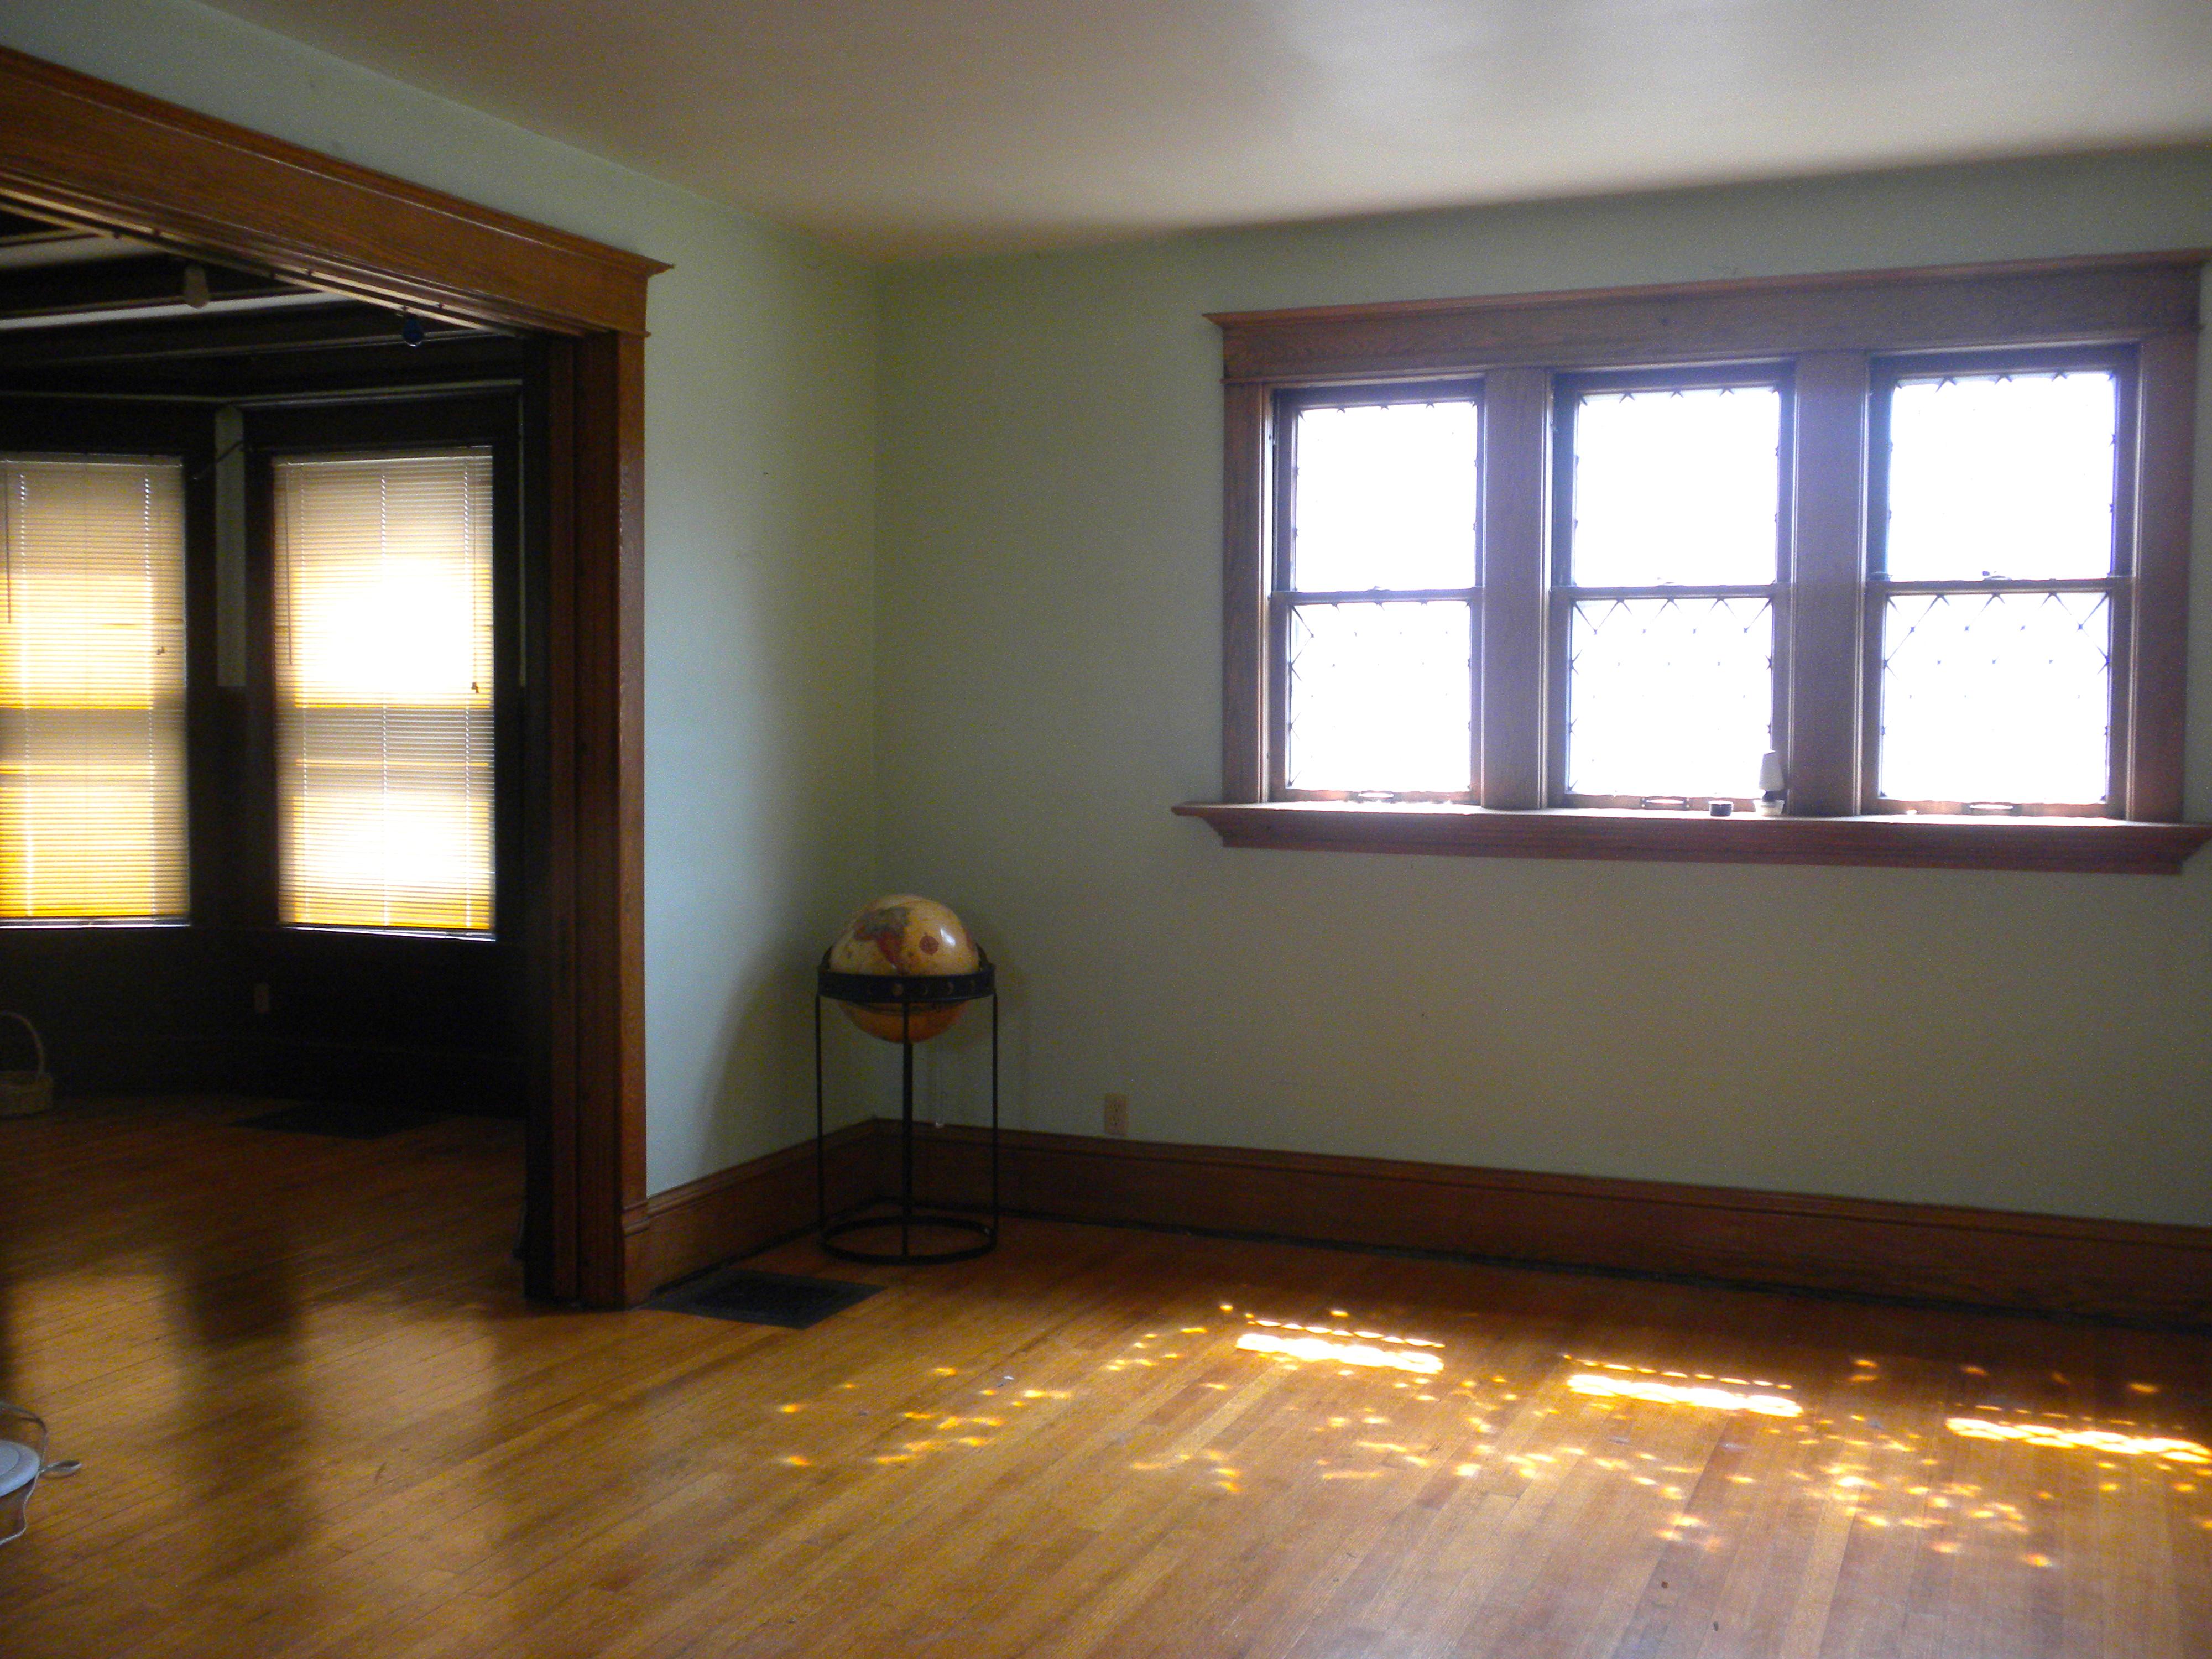 Don Blaheta : Buy my awesome house!